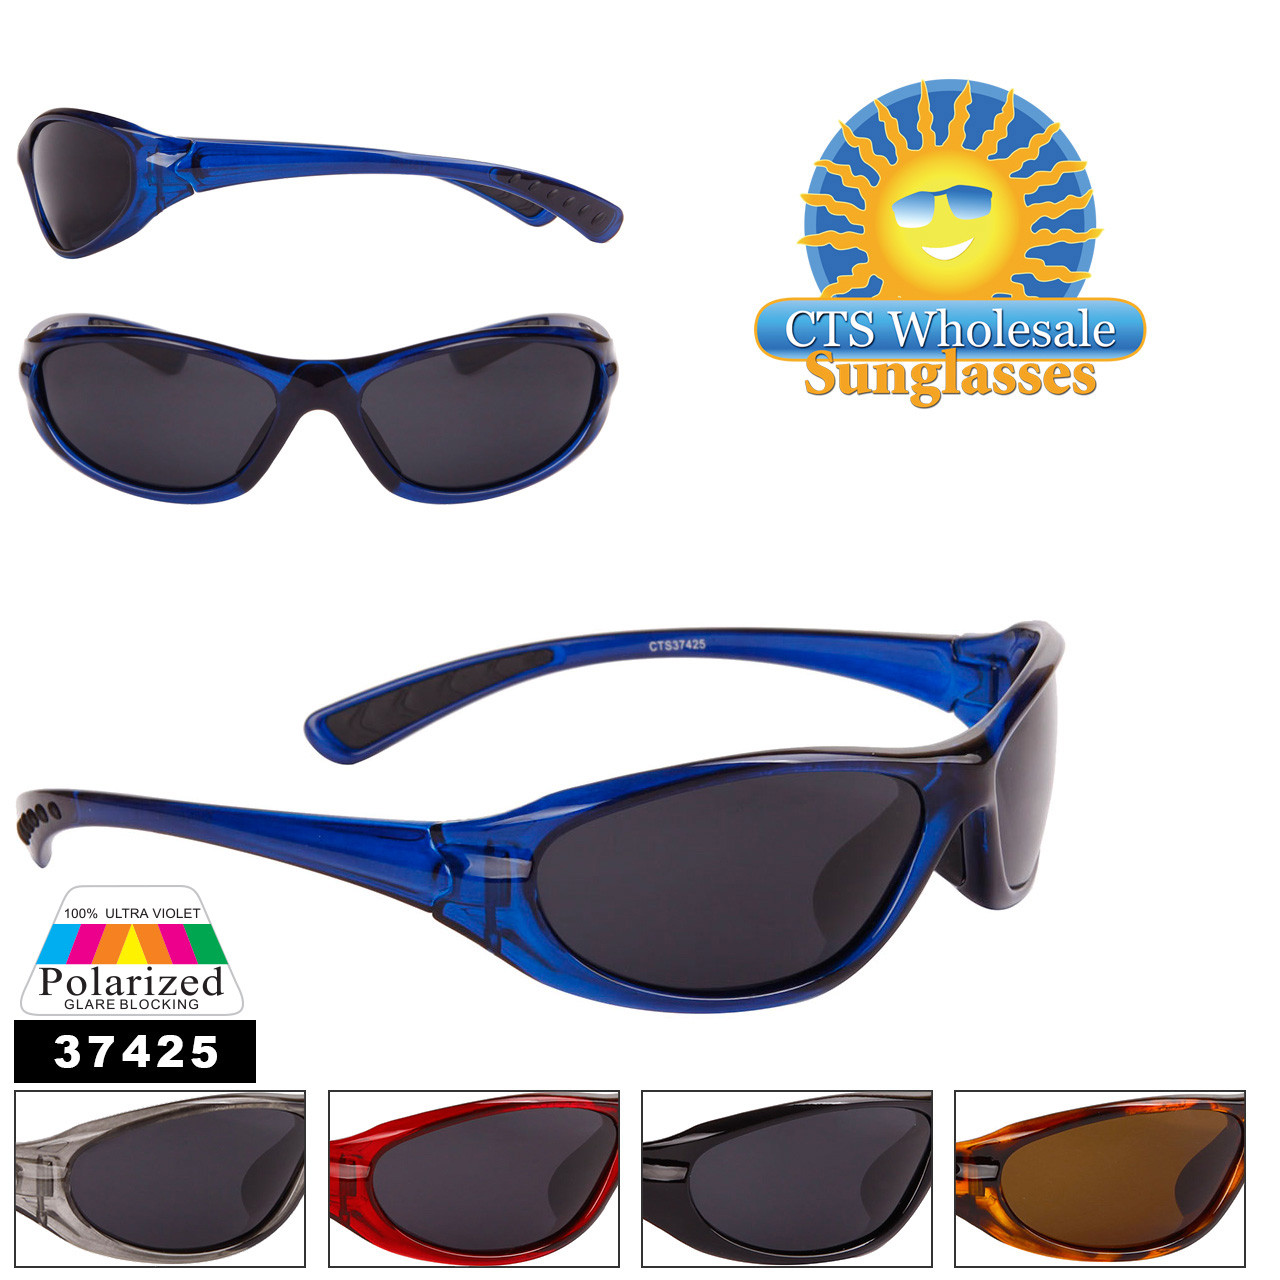 Bulk Men's Polarized Sunglasses - Style #37425 (Assorted Colors) (12 pcs.)